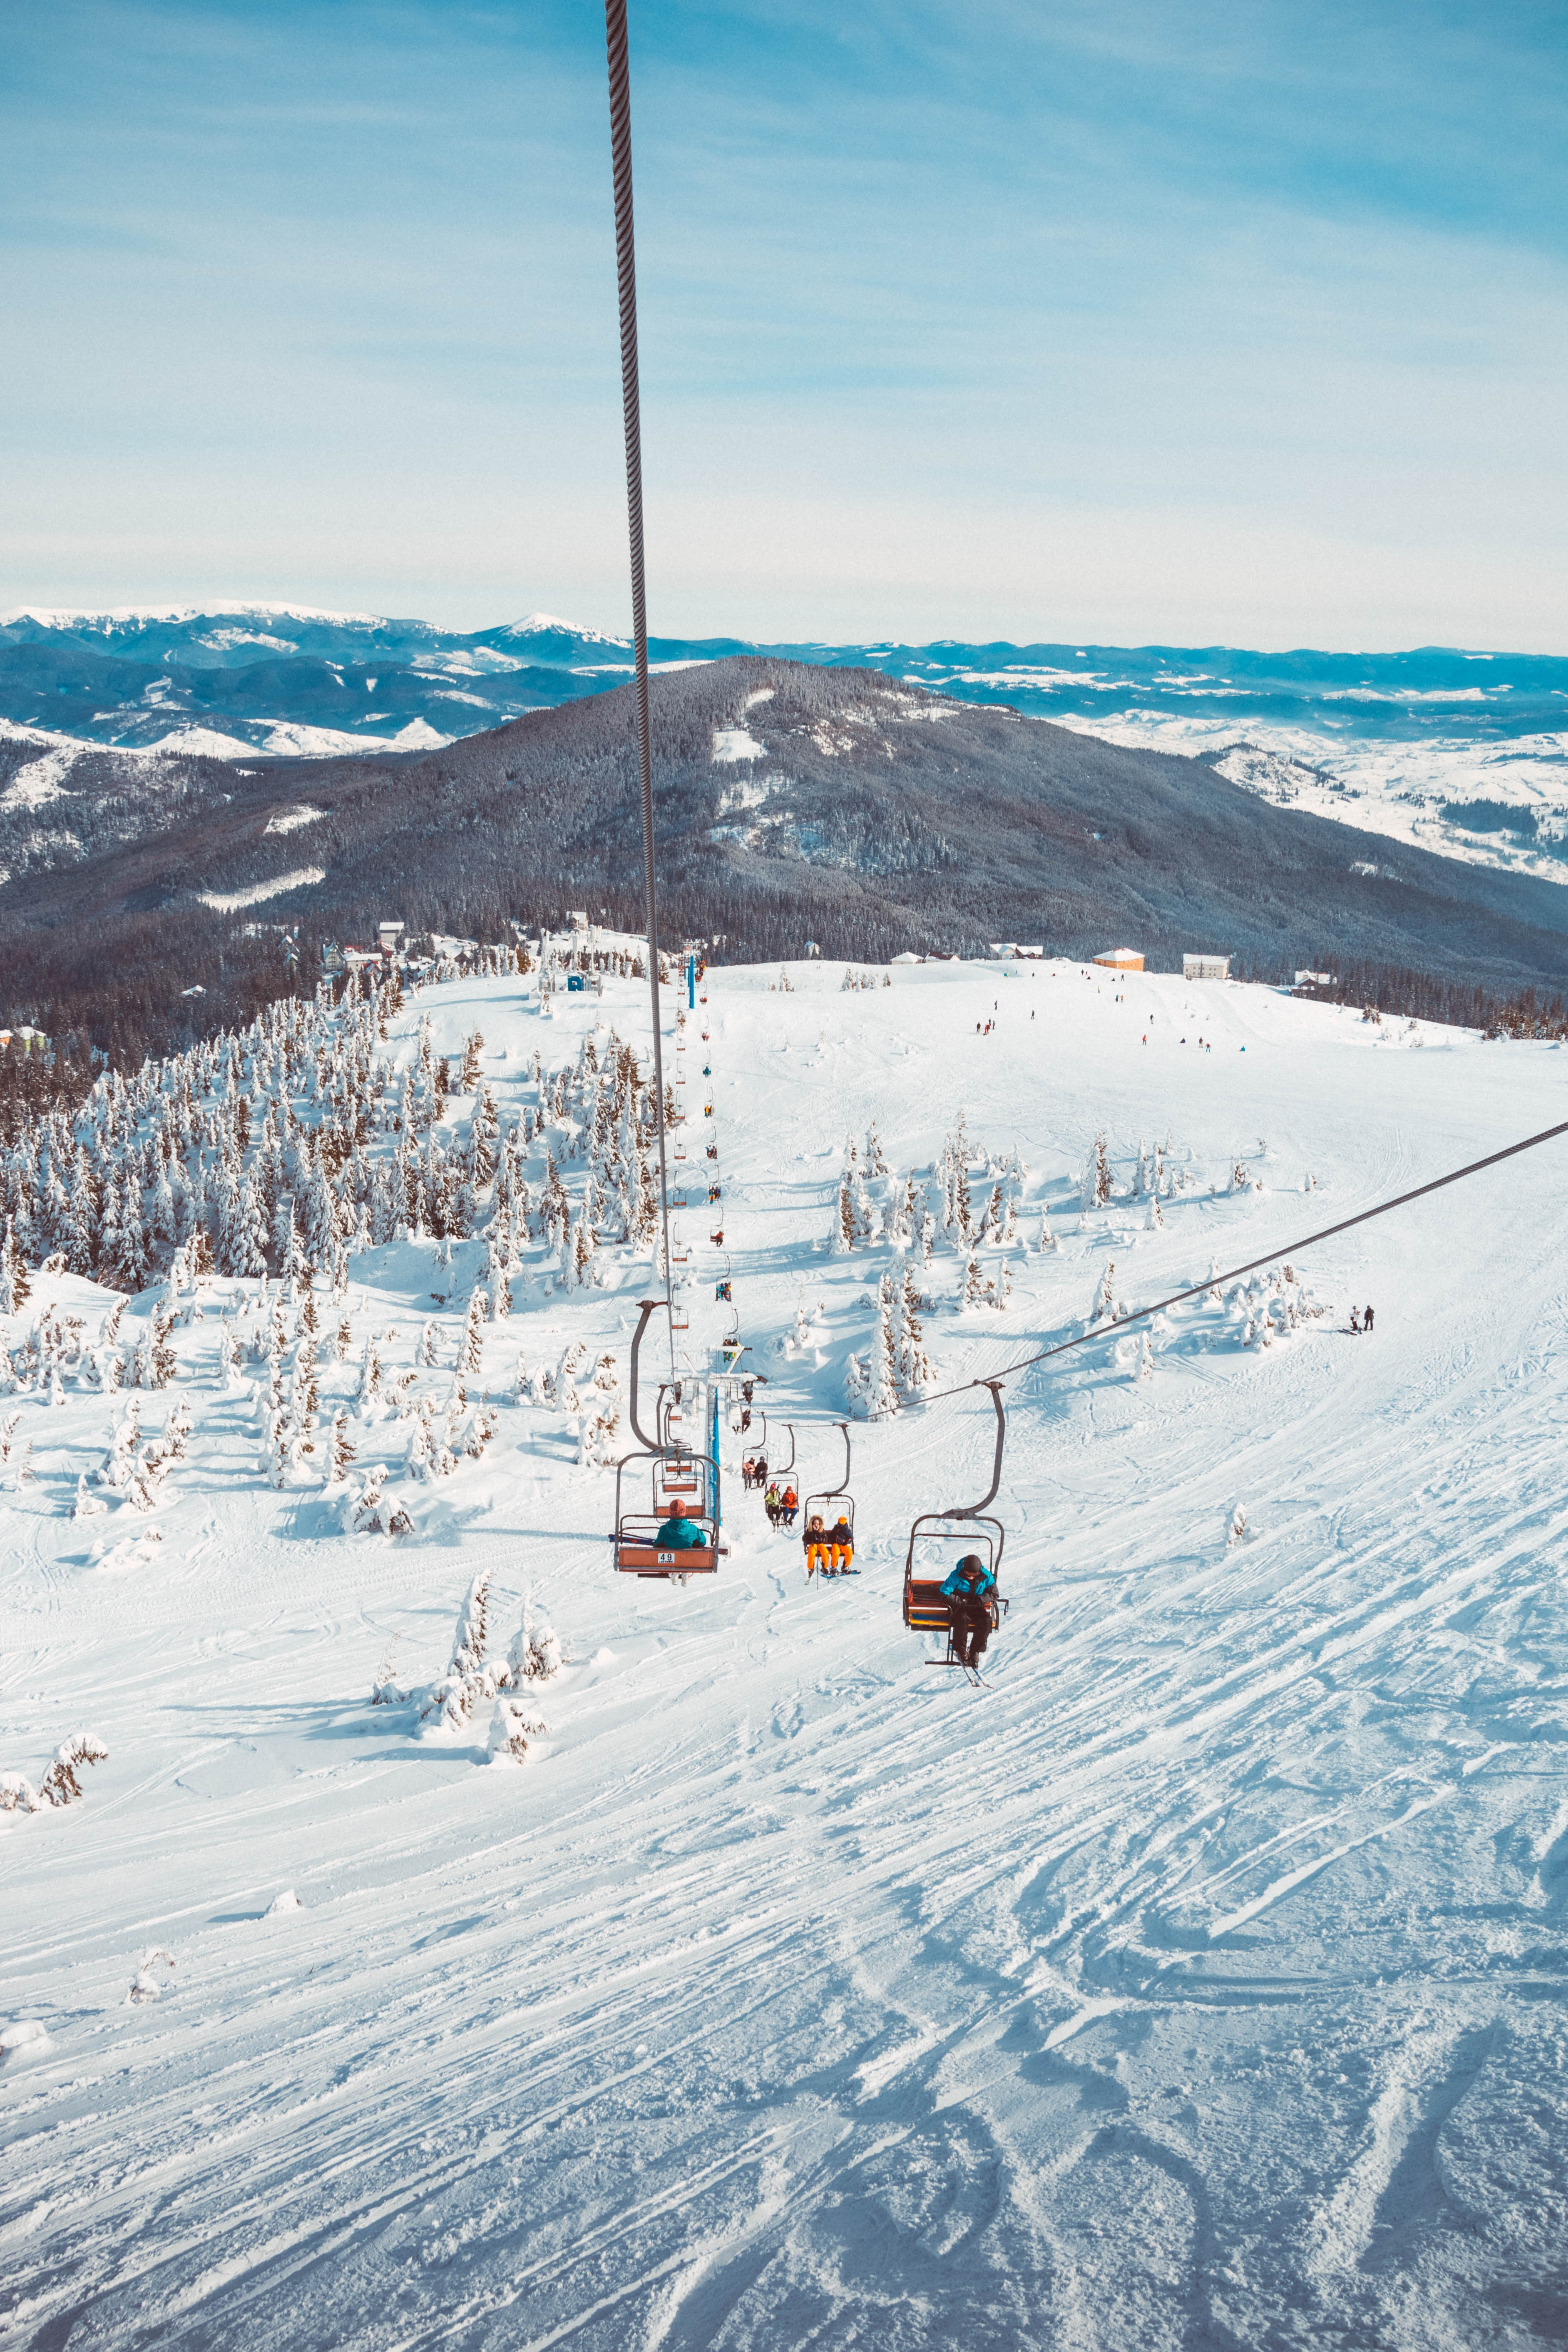 Ski lift going up a snowy mountain